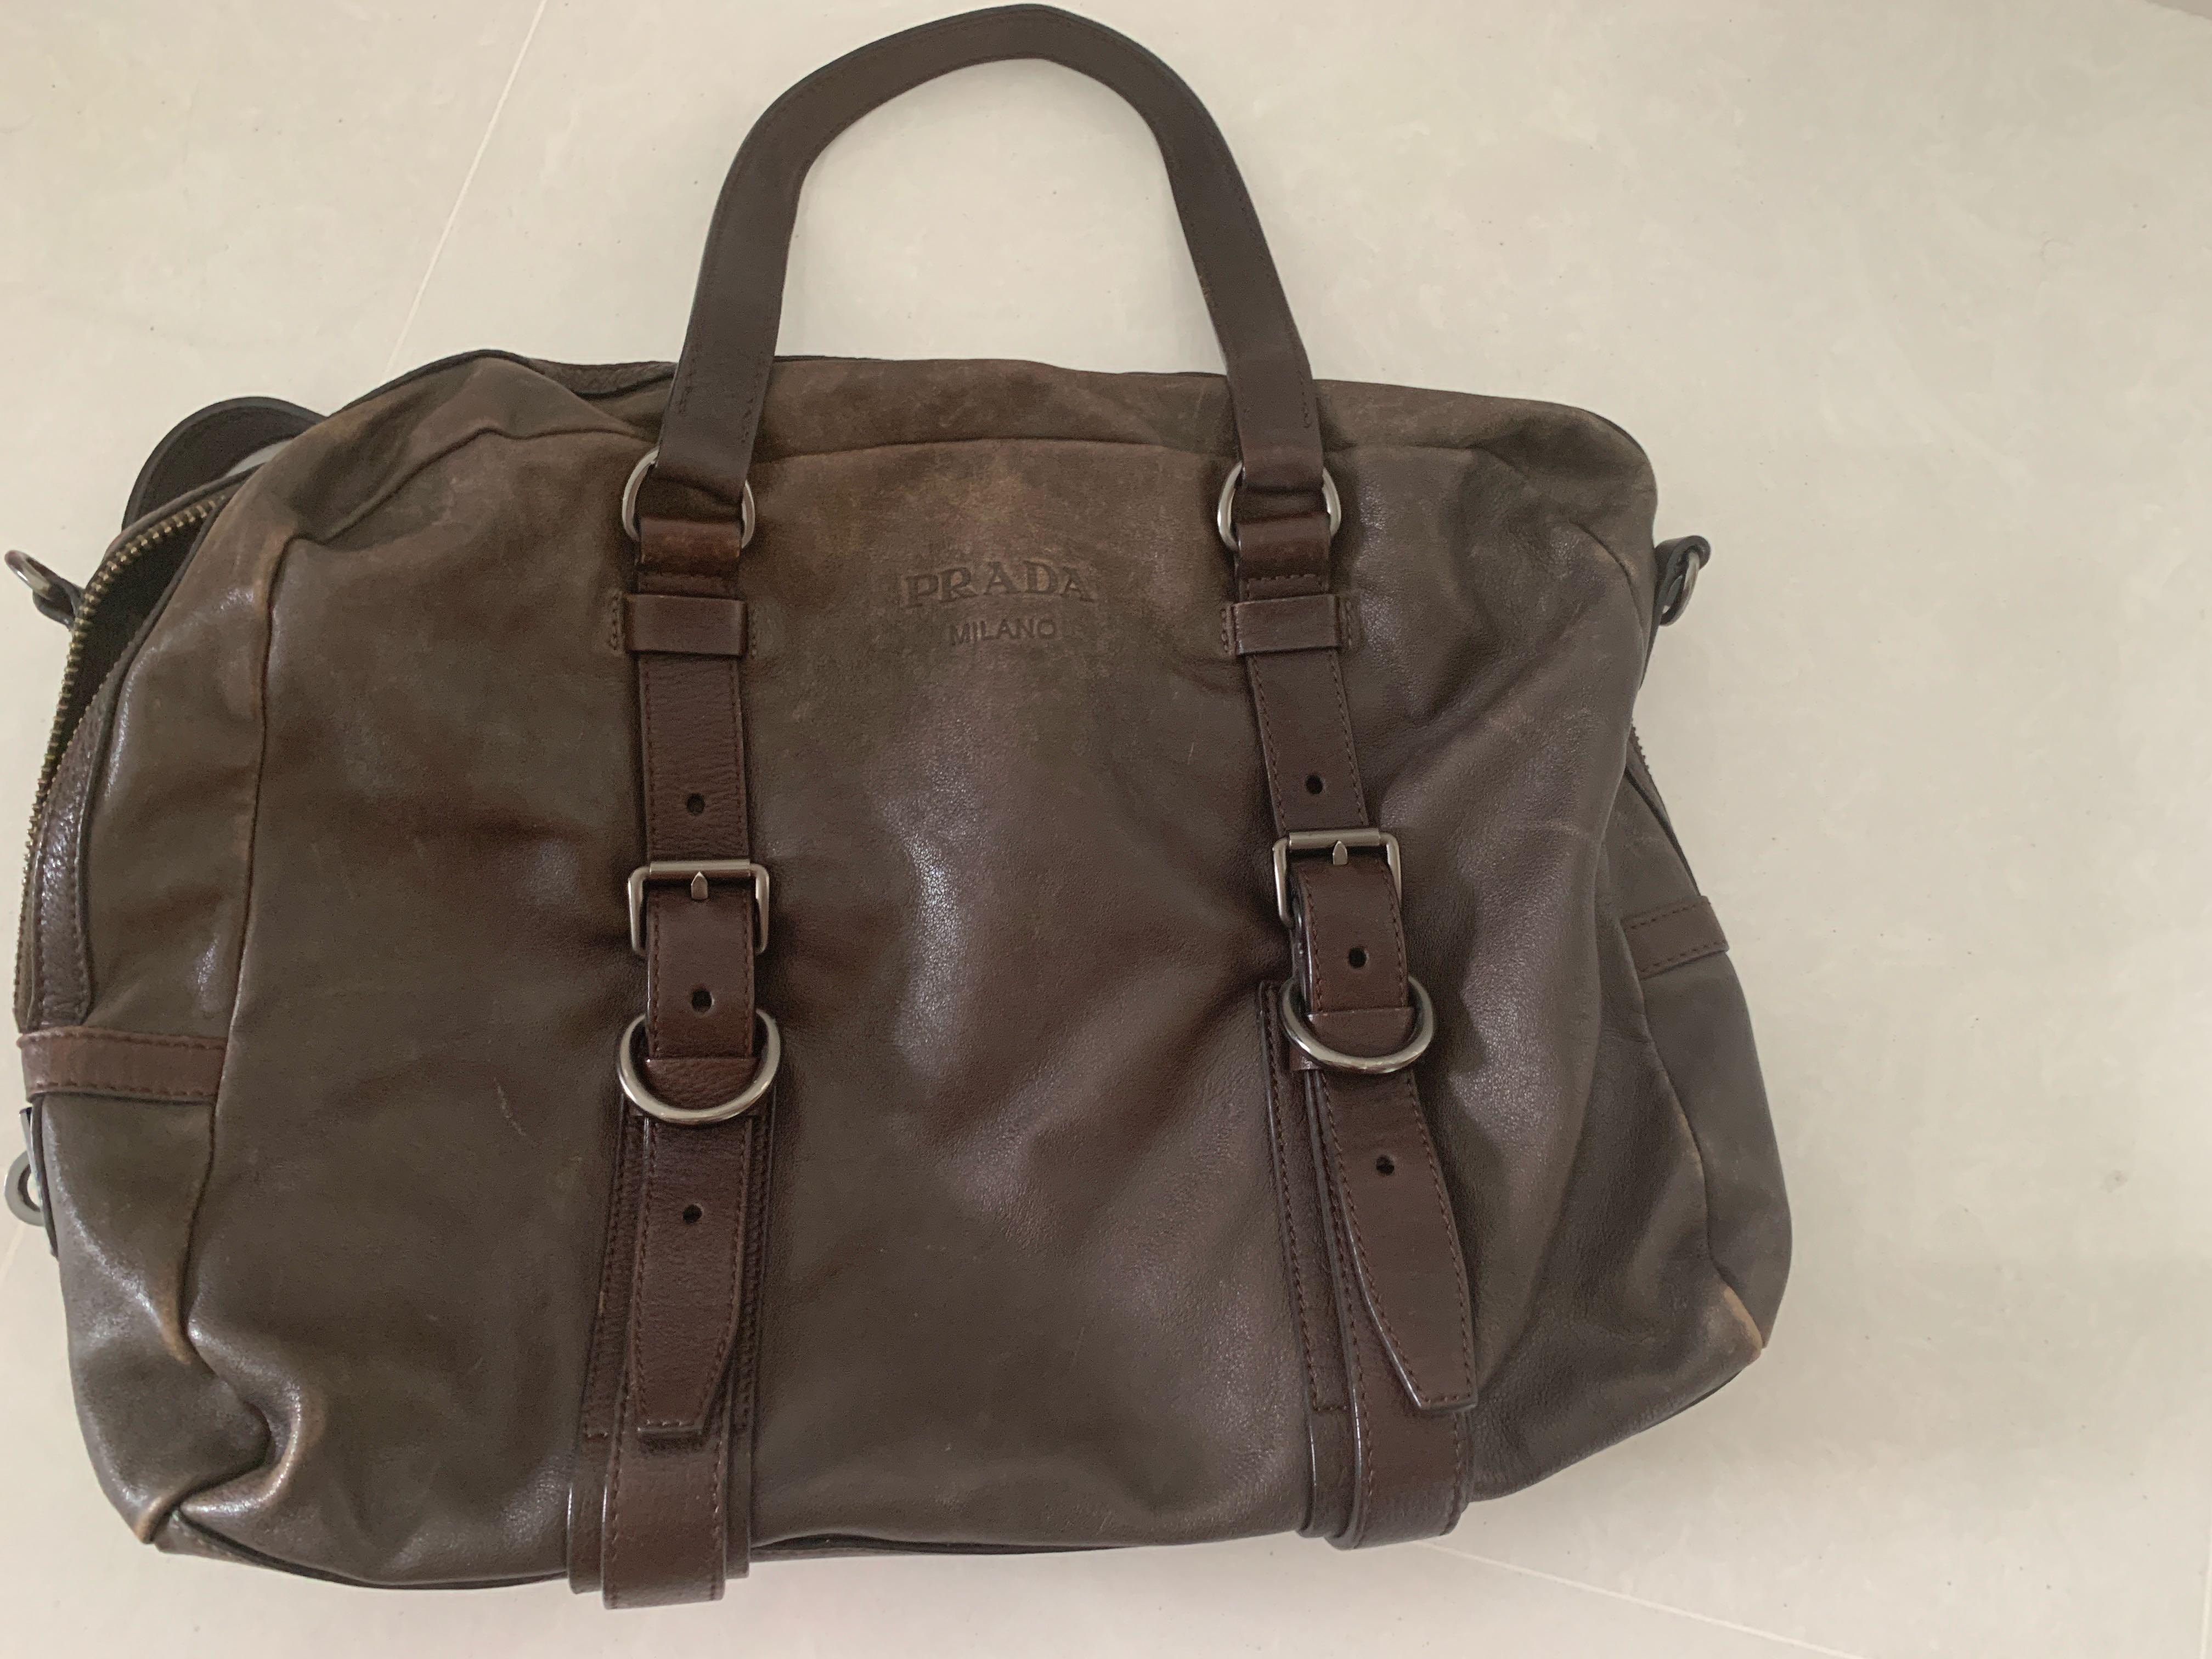 1b036c14298e Prada vintage bag, Men's Fashion, Bags & Wallets, Briefcases on ...